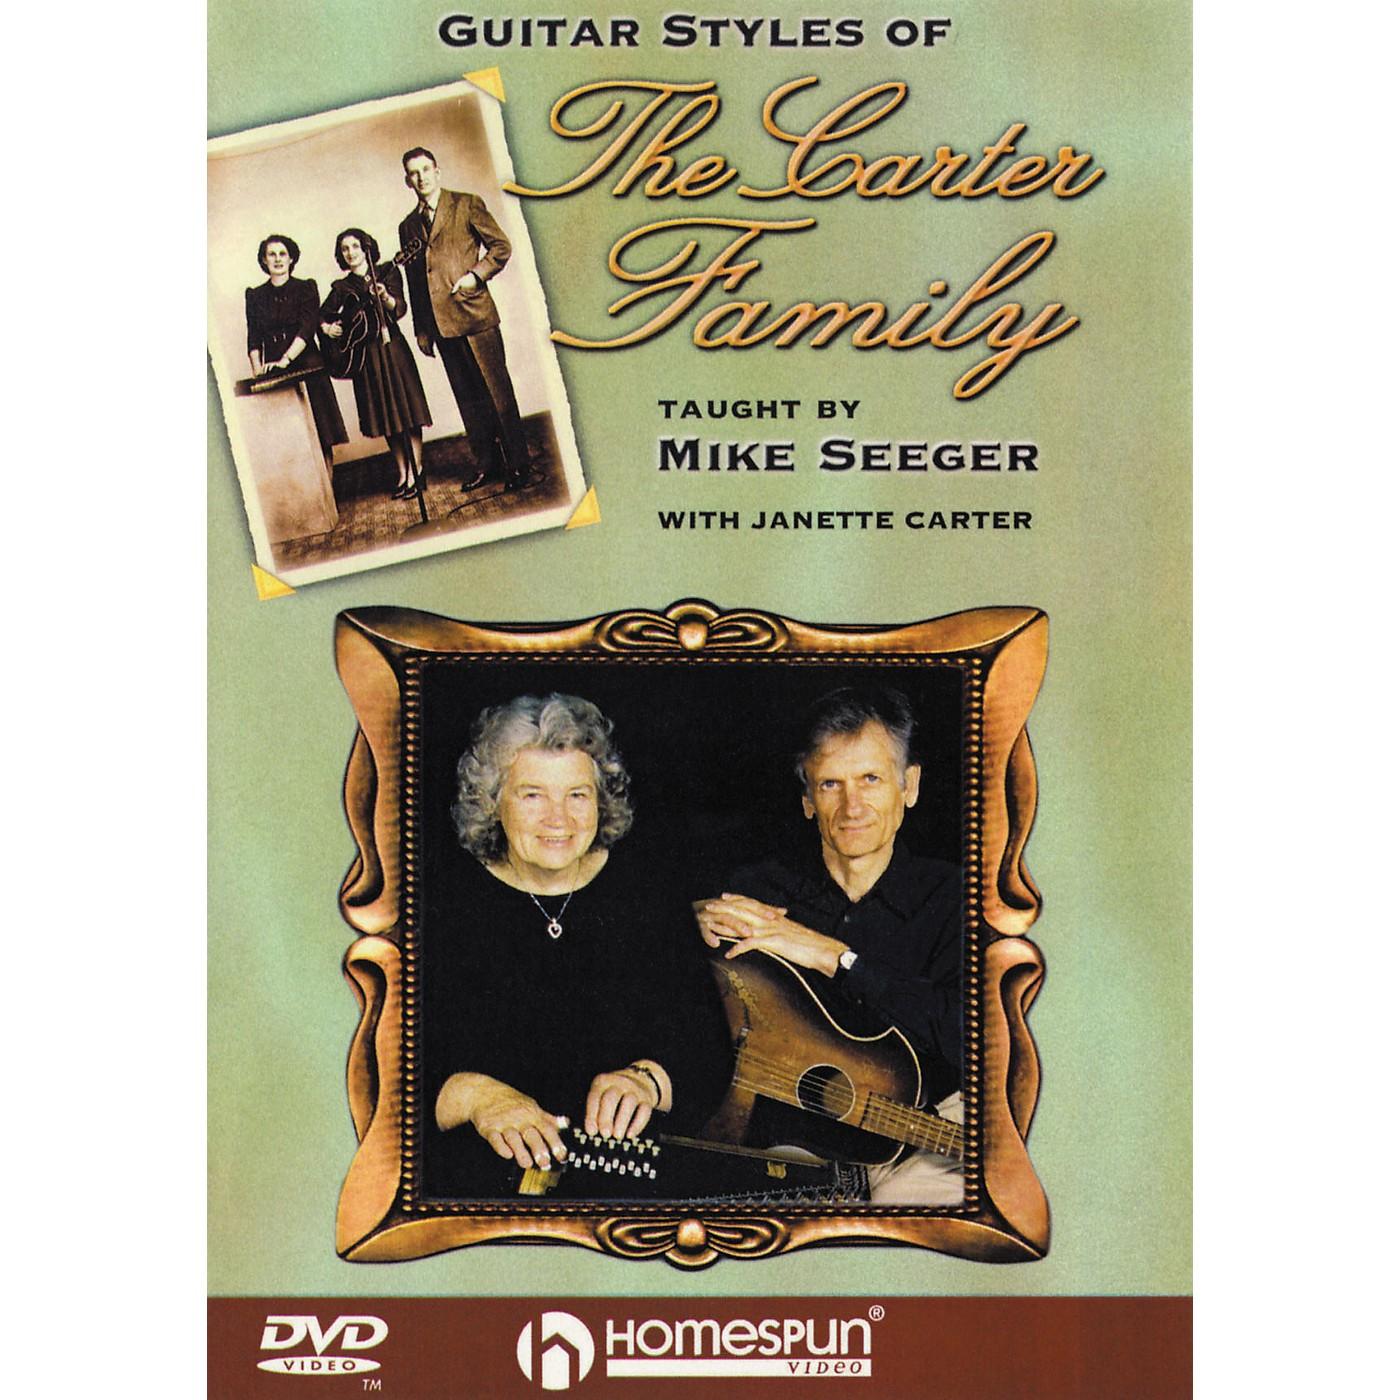 Homespun Guitar Styles of the Carter Family (DVD) thumbnail